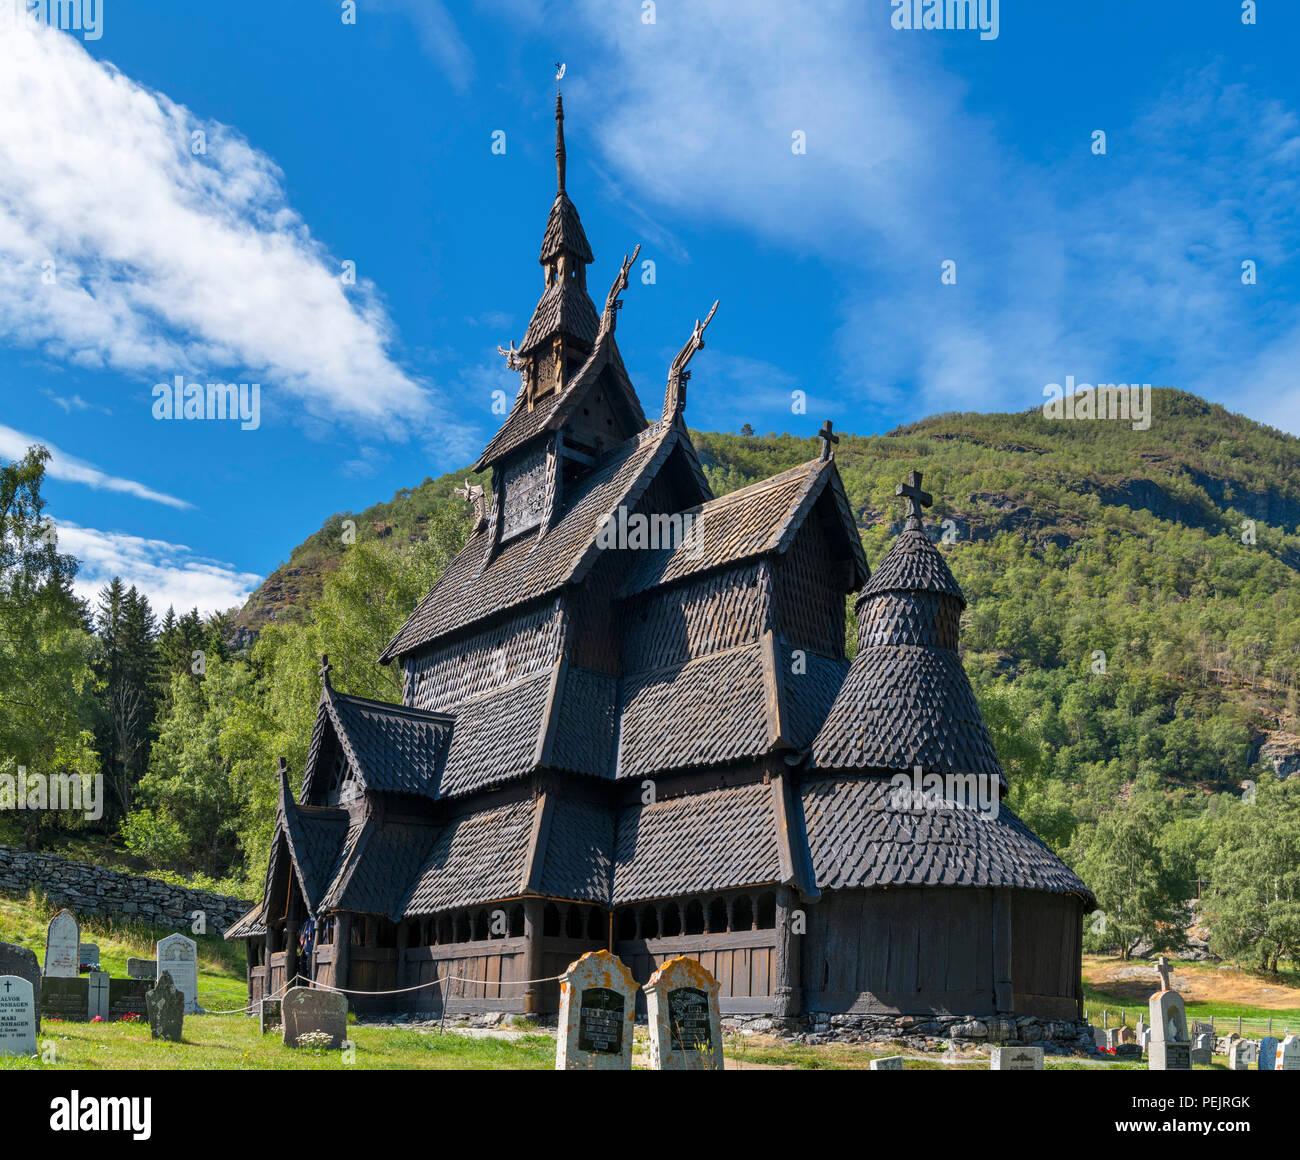 Borgund Stave Church (Borgund stavkyrkje), Borgund, Lærdal, Norway - Stock Image